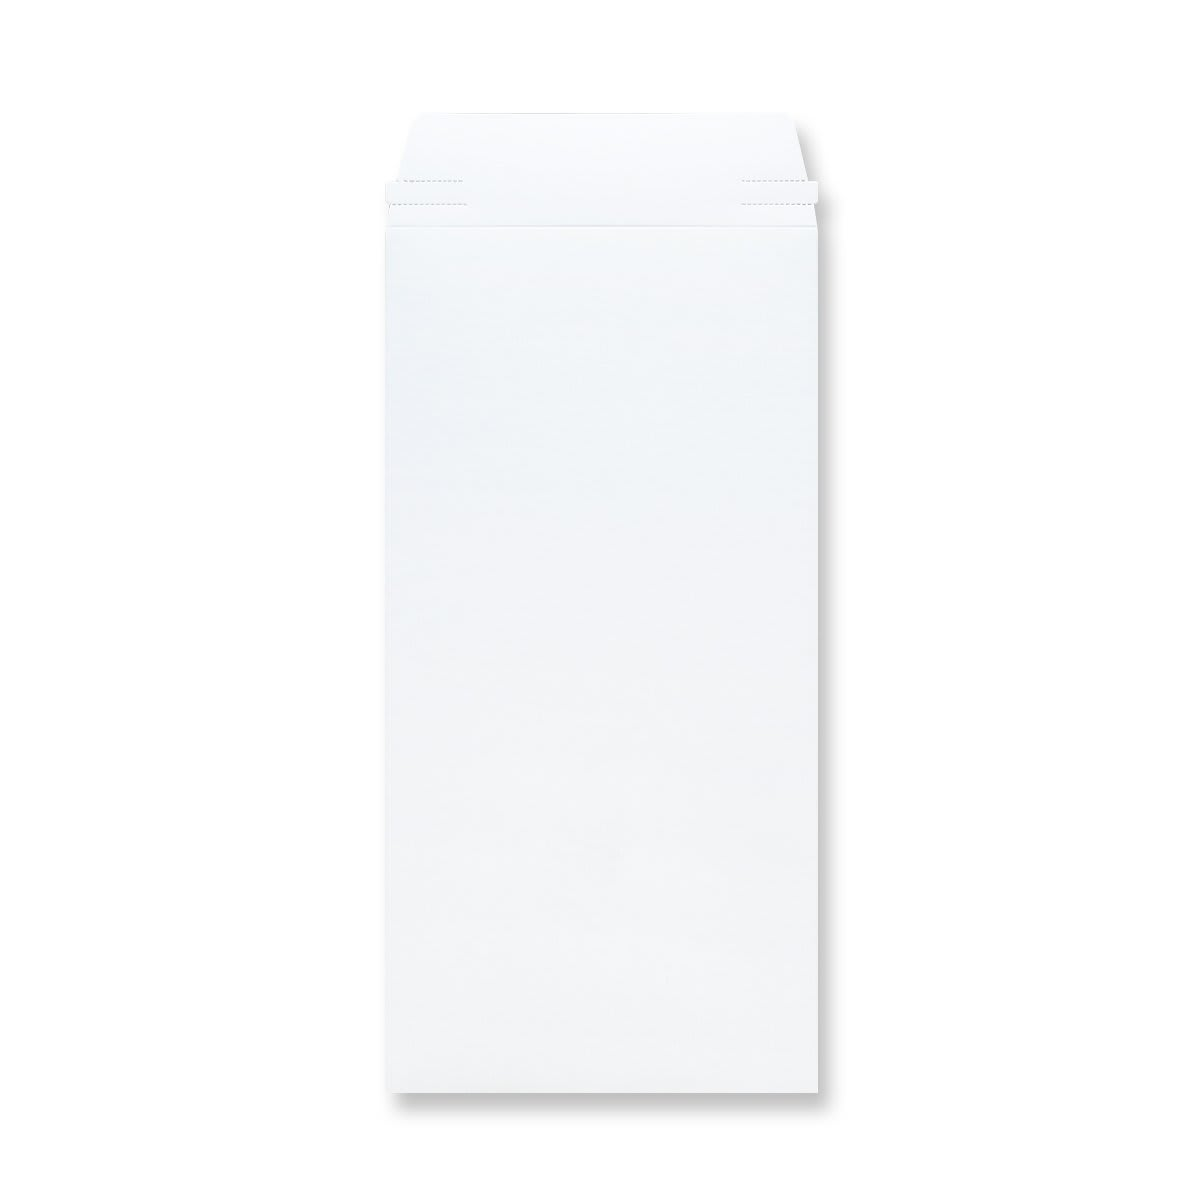 305 x 152mm WHITE ALL BOARD ENVELOPES